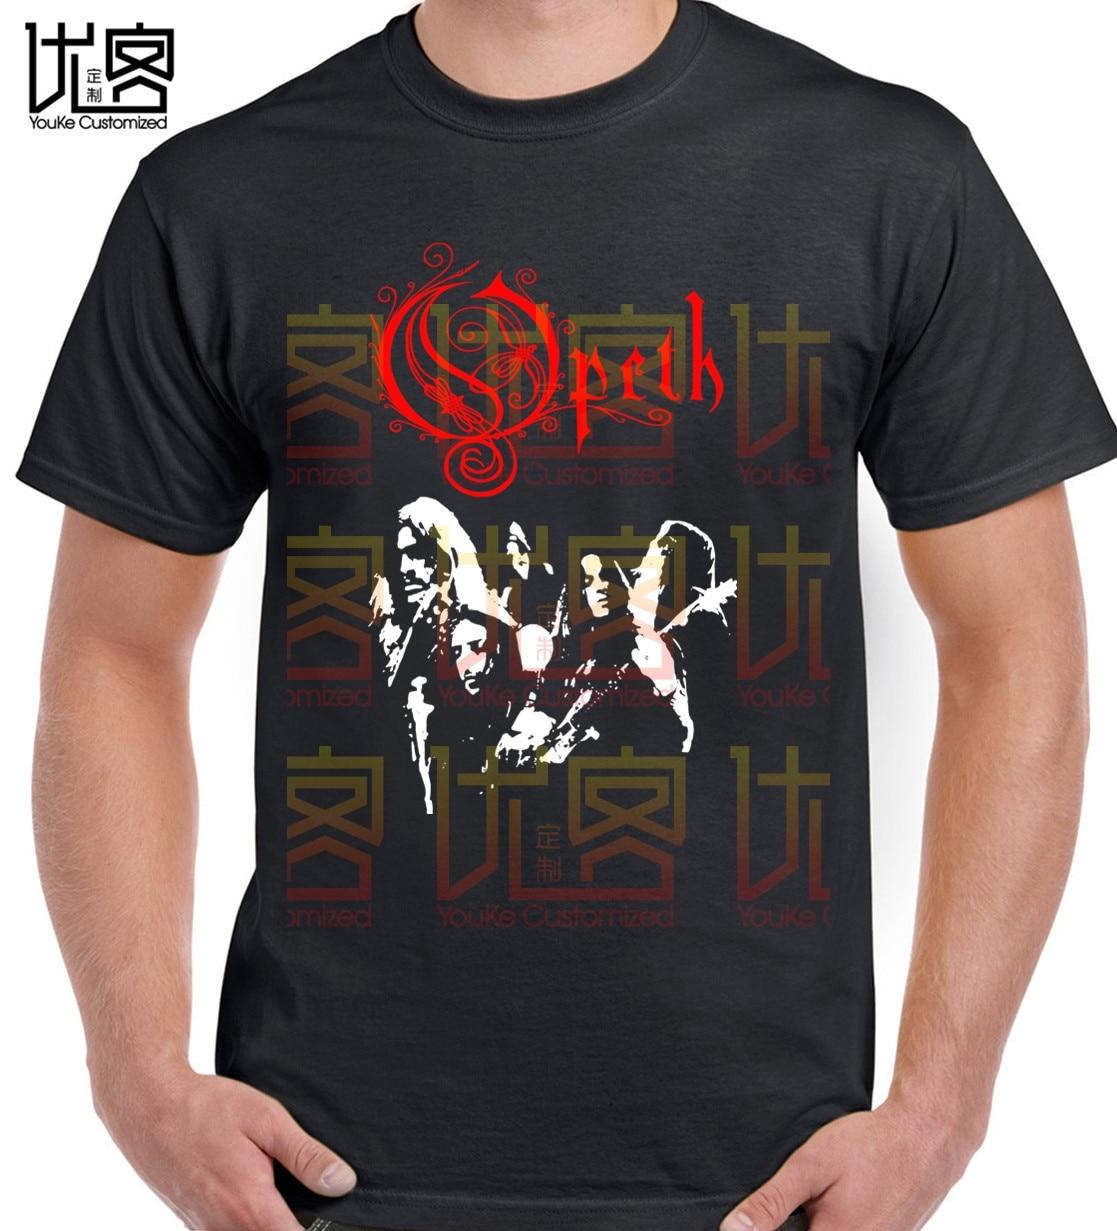 Camiseta opeth logo vermelho regata Tops algodón verano Camisetas cuello redondo camiseta increíble manga corta única